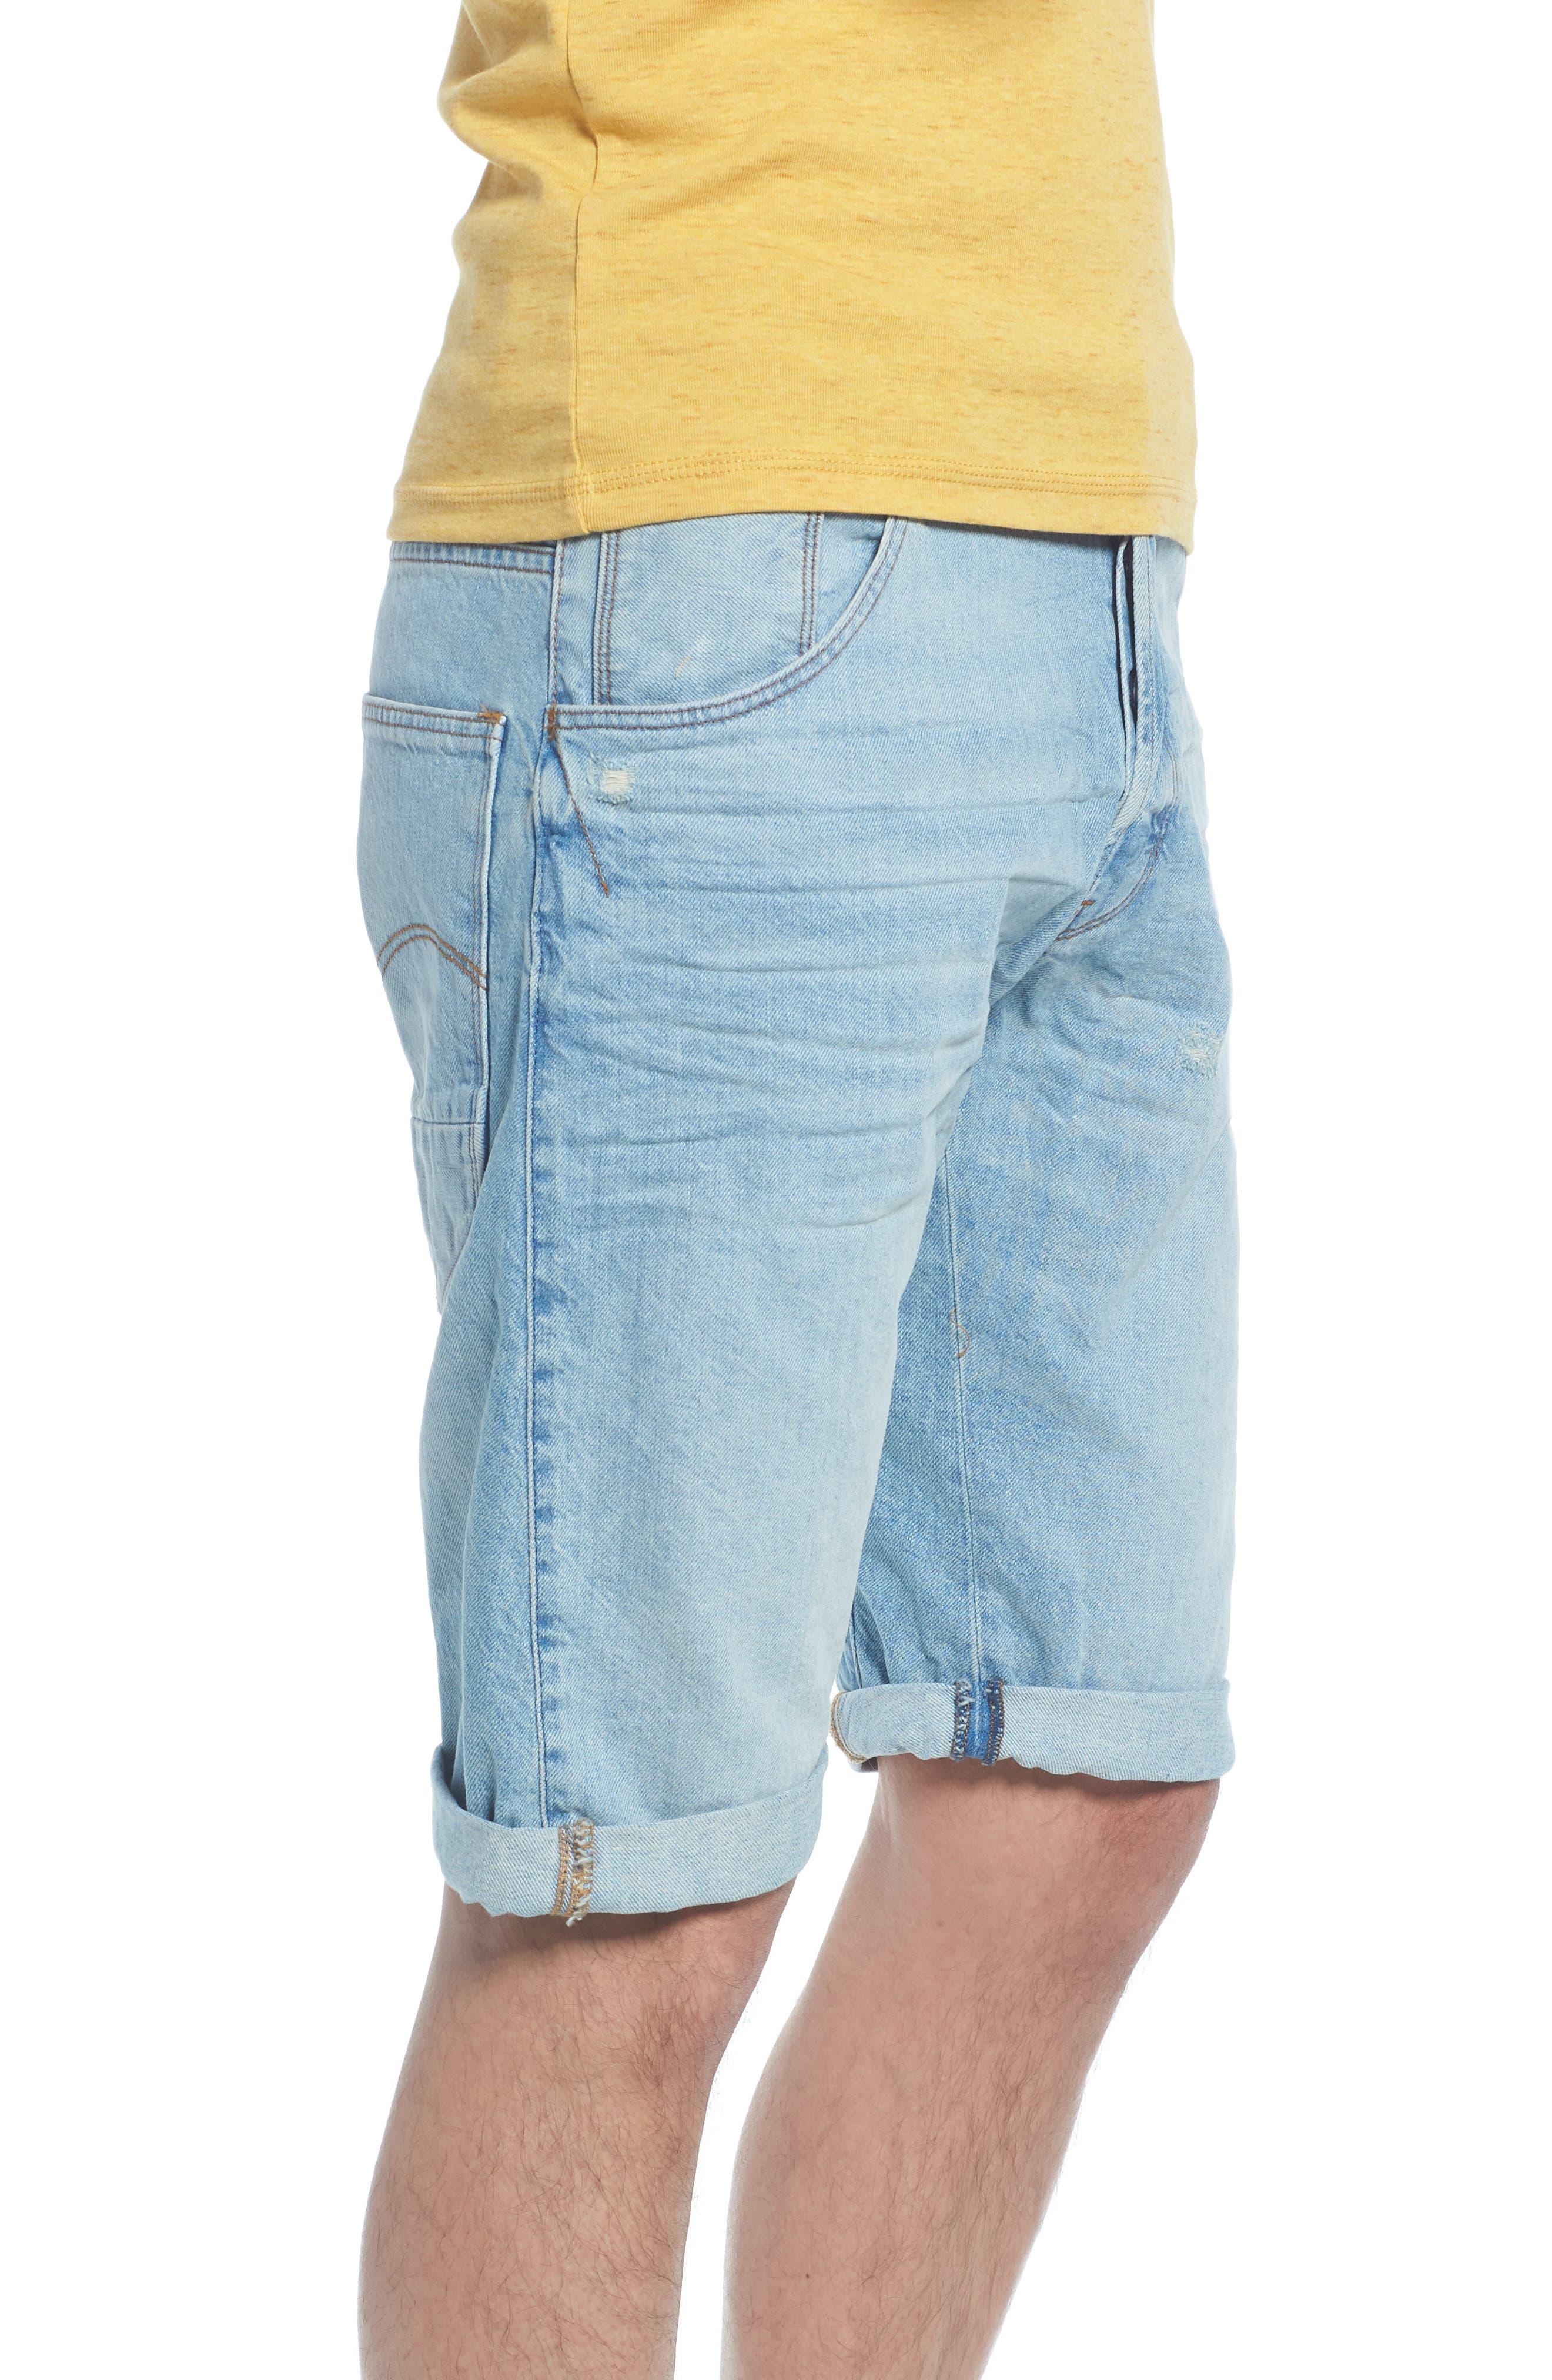 Arc 3D Shorts,                             Alternate thumbnail 3, color,                             Light Aged Blue